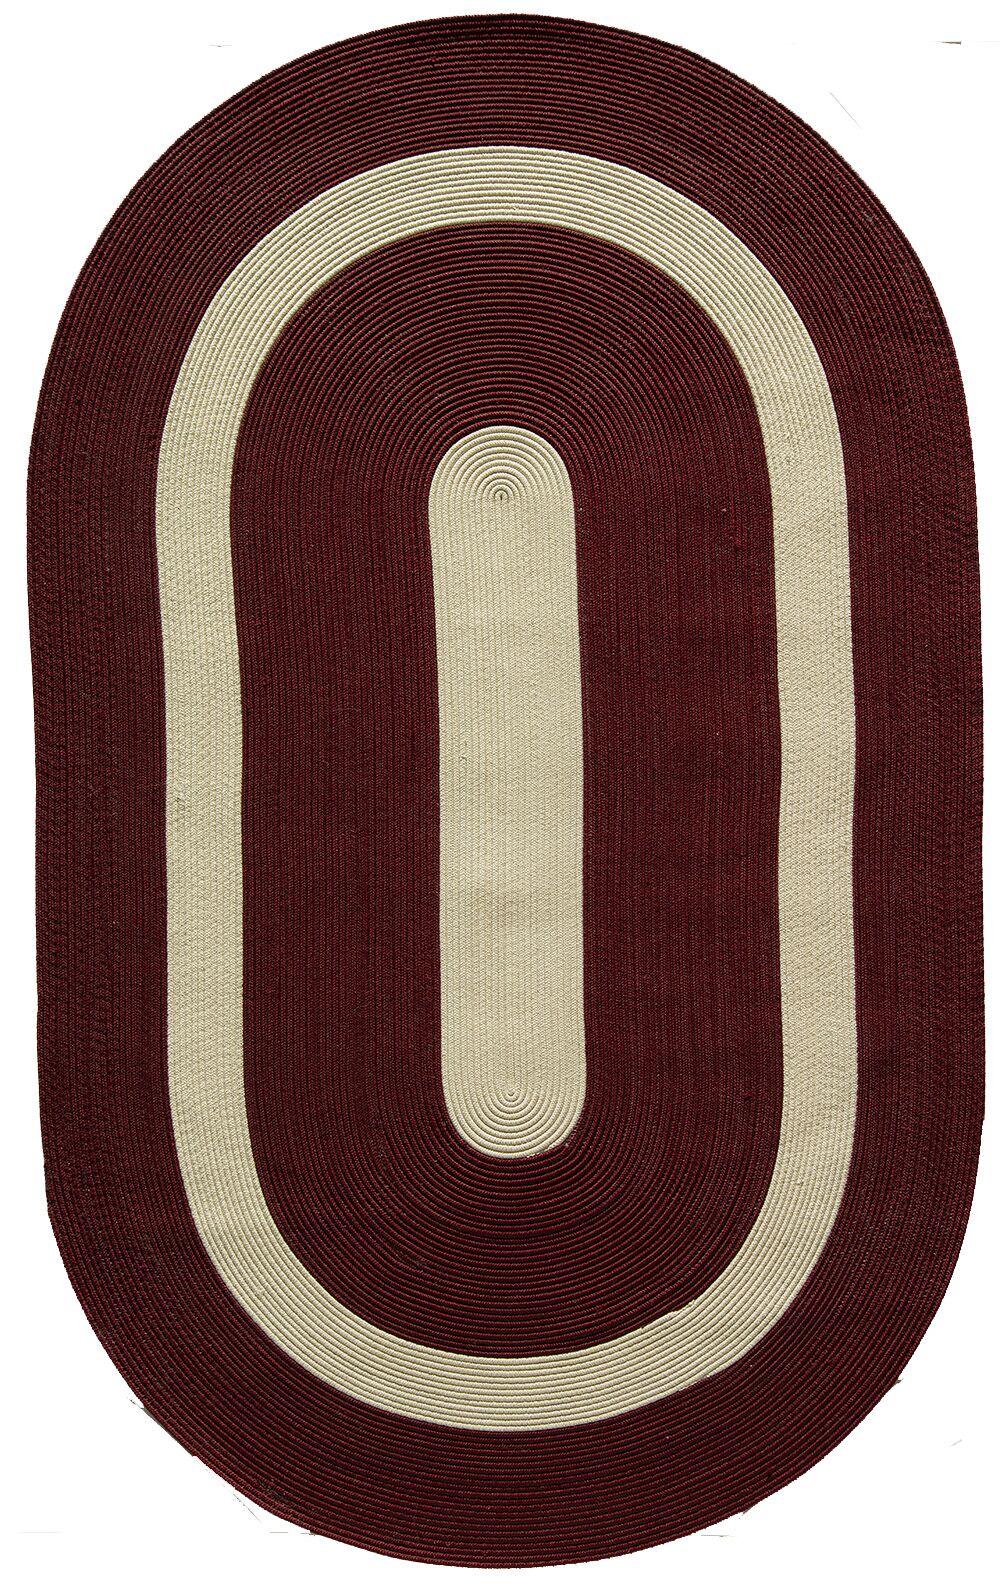 Plymouth Burgundy Area Rug Rug Size: Oval 8' x 11'